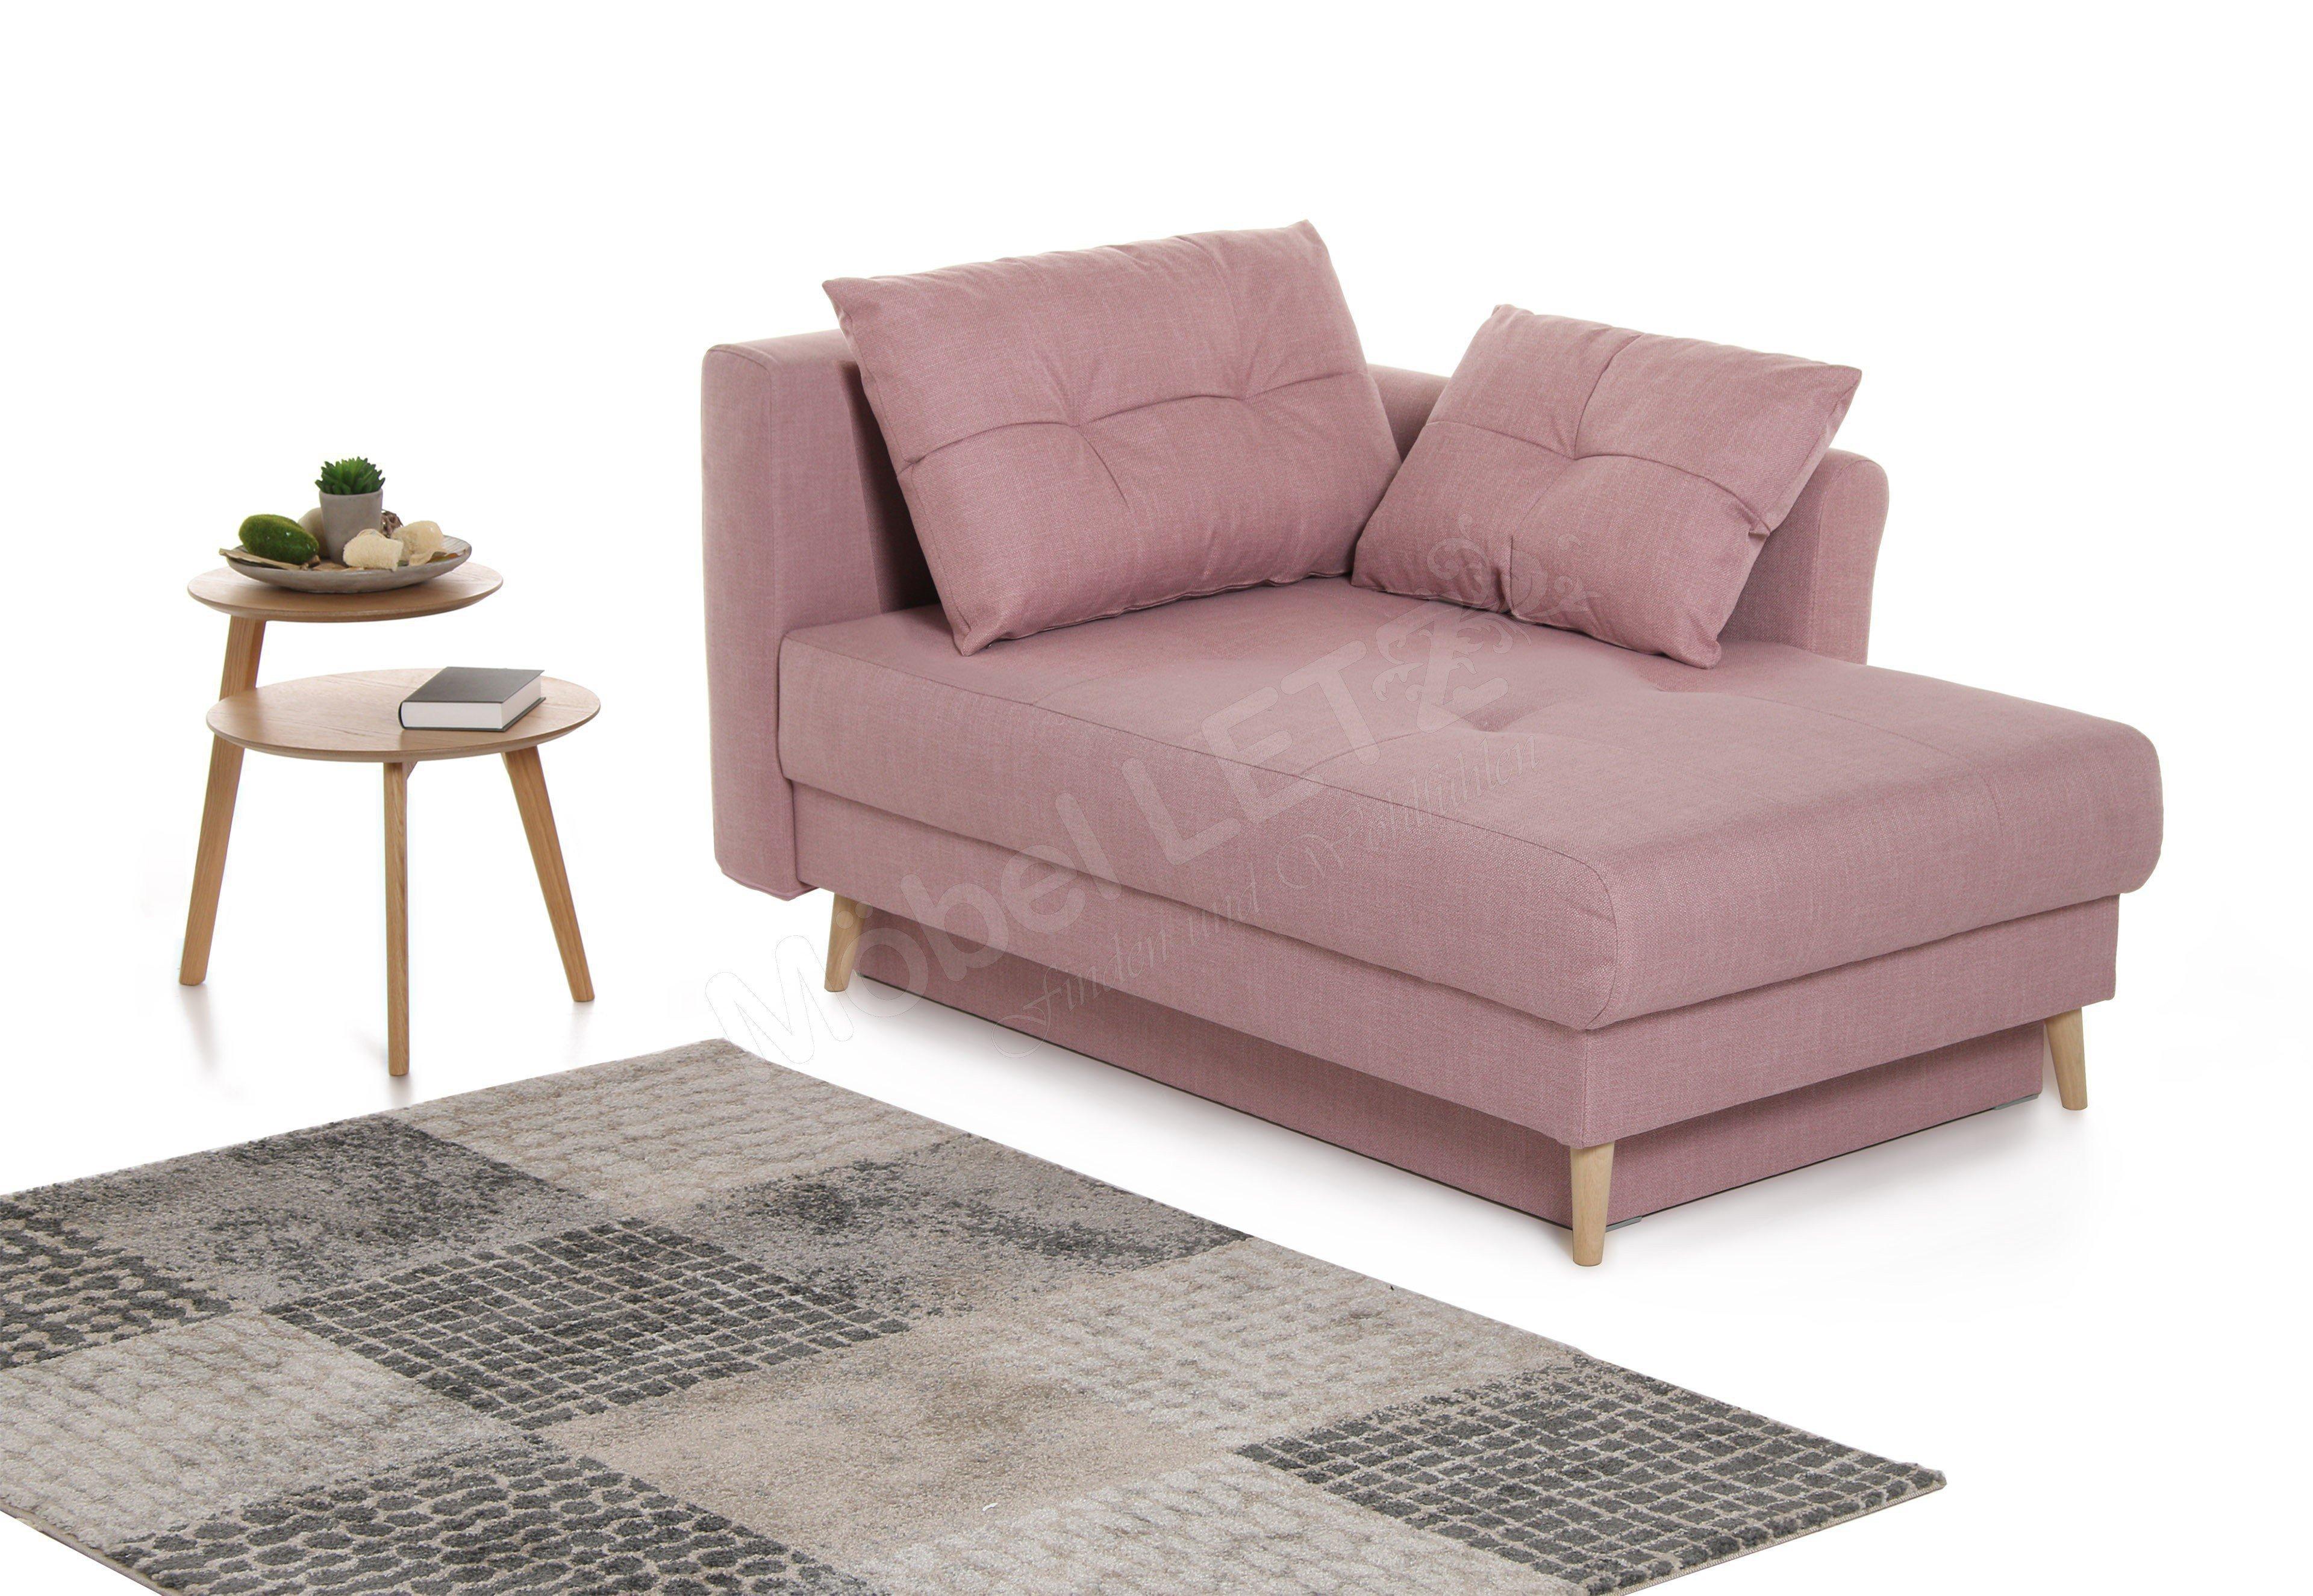 Skandinavische Sofas Modell : Sofa design ansprechend skandinavische reproduktionsmöbel